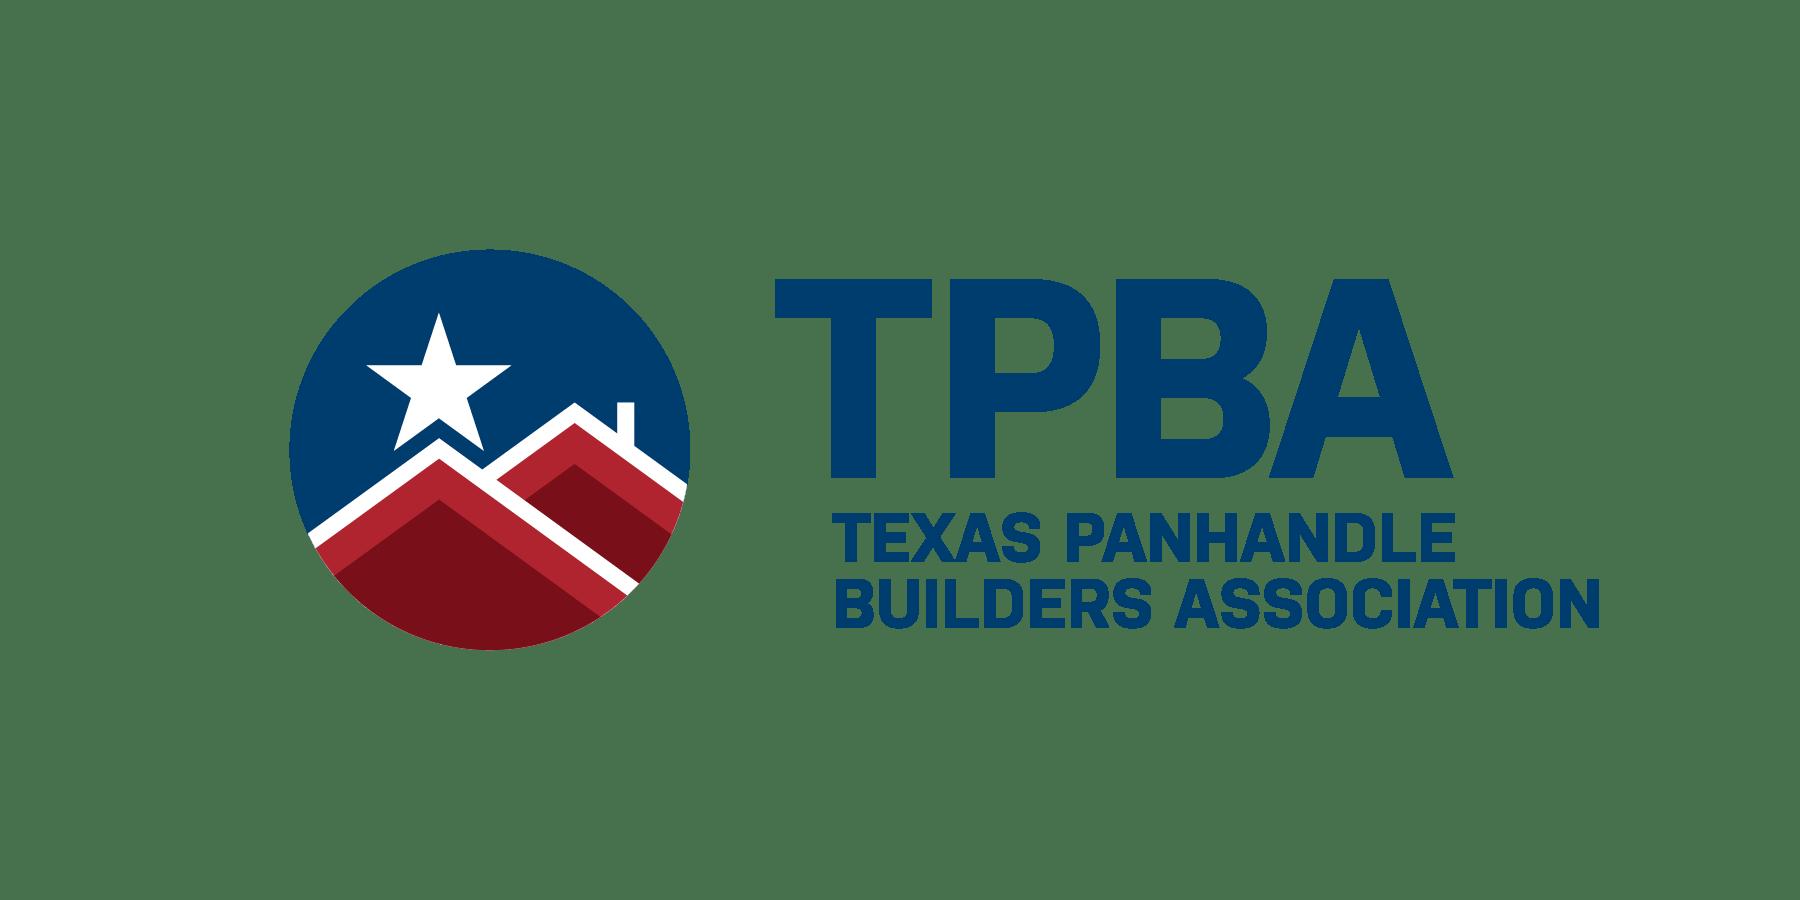 Texas Panhandle Builders Assocaiton